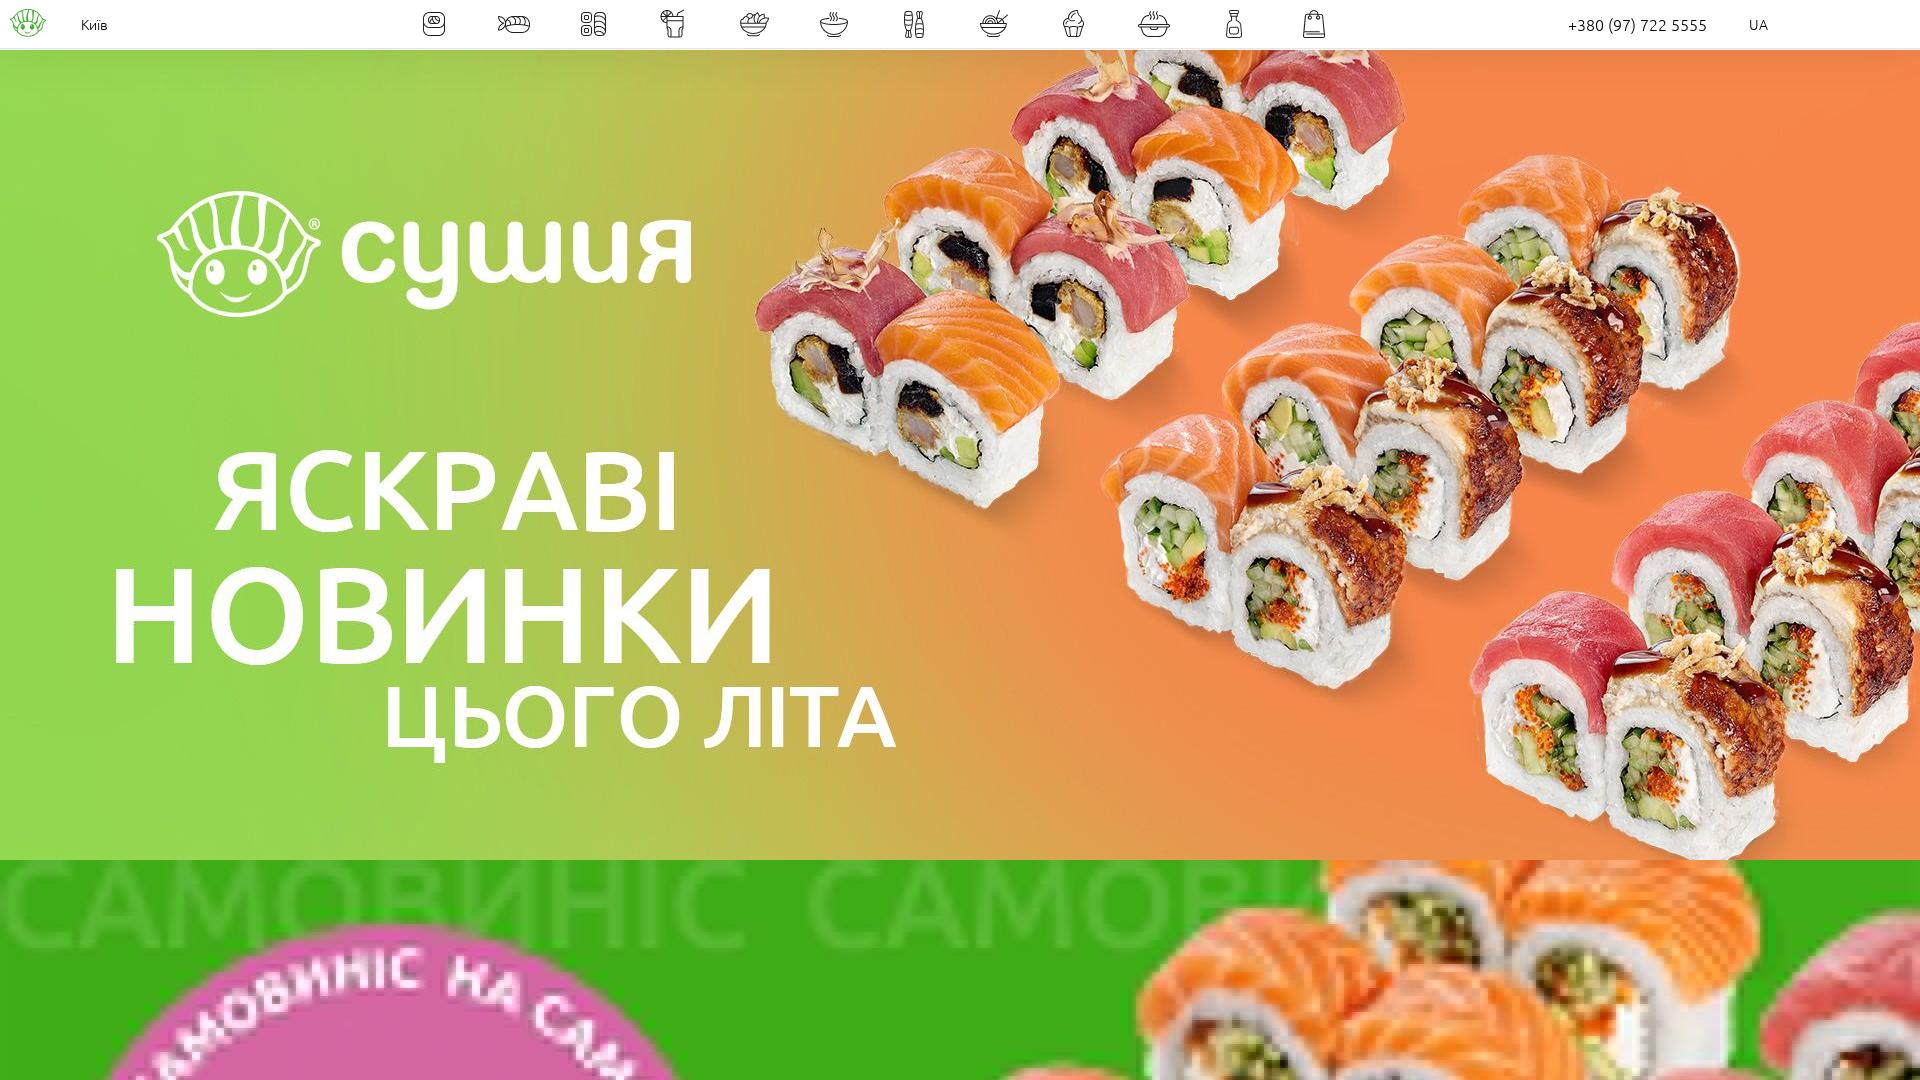 Sushiya UA website